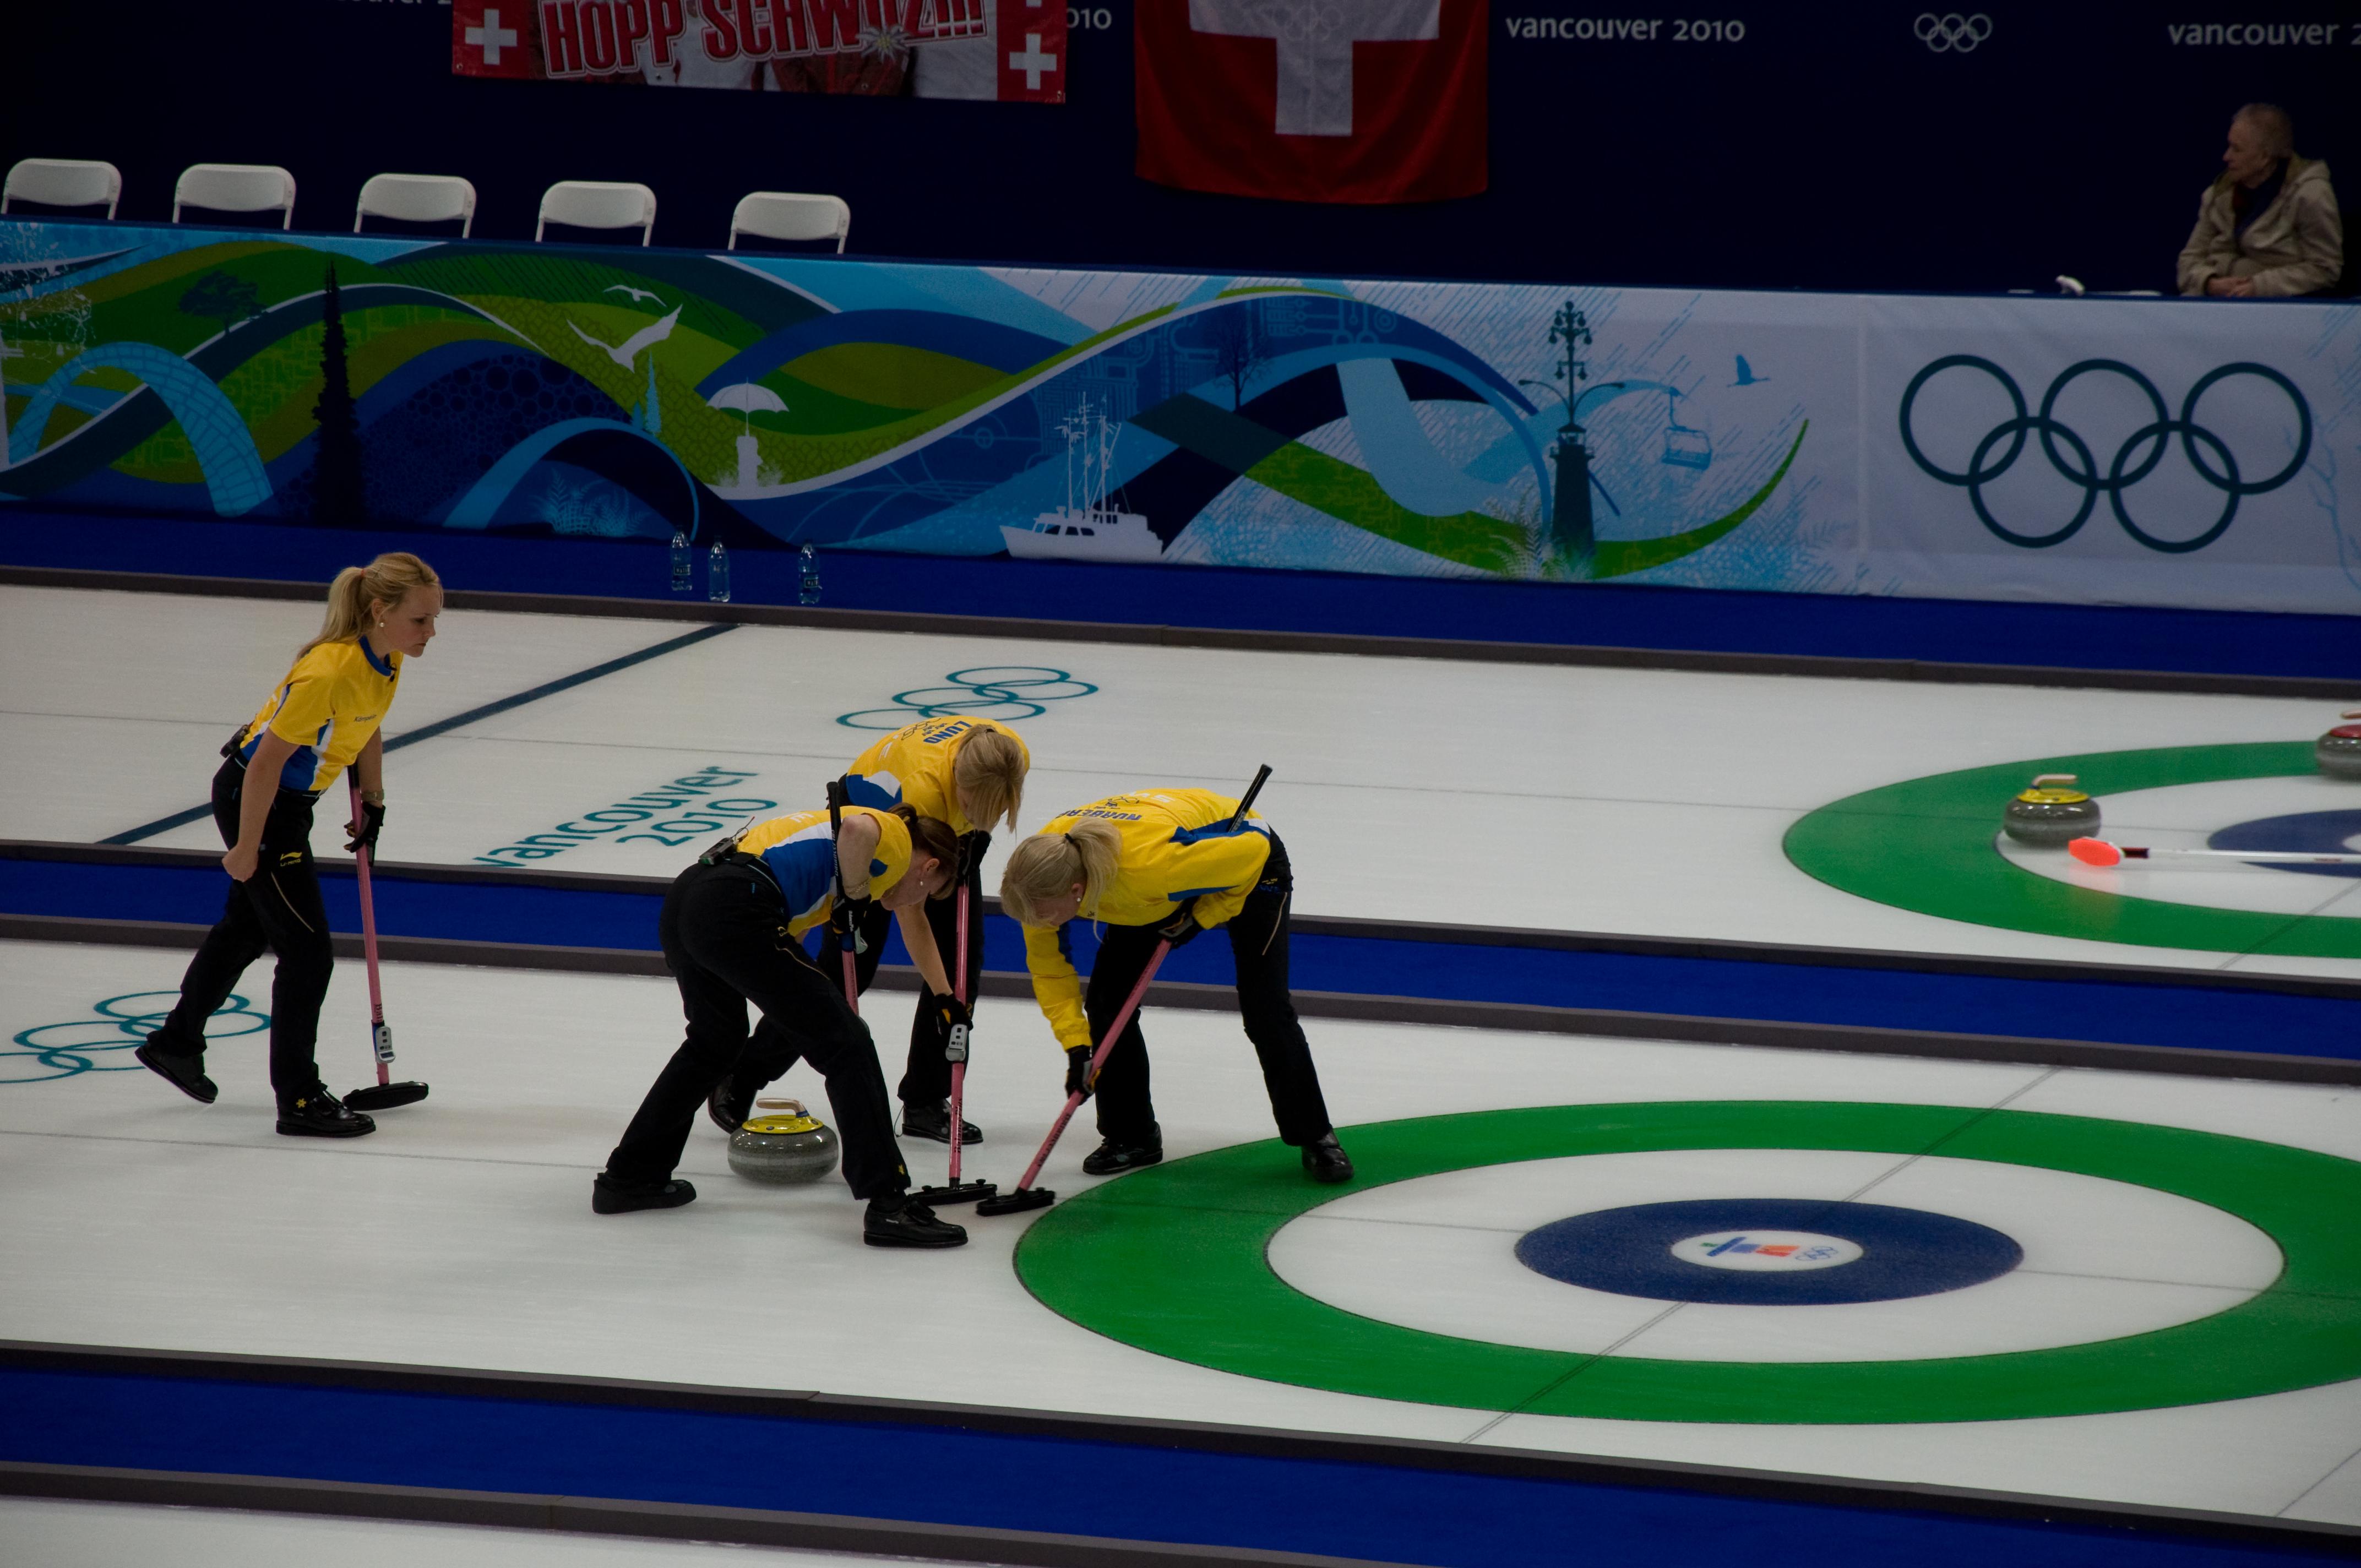 2010 winter olympics curling